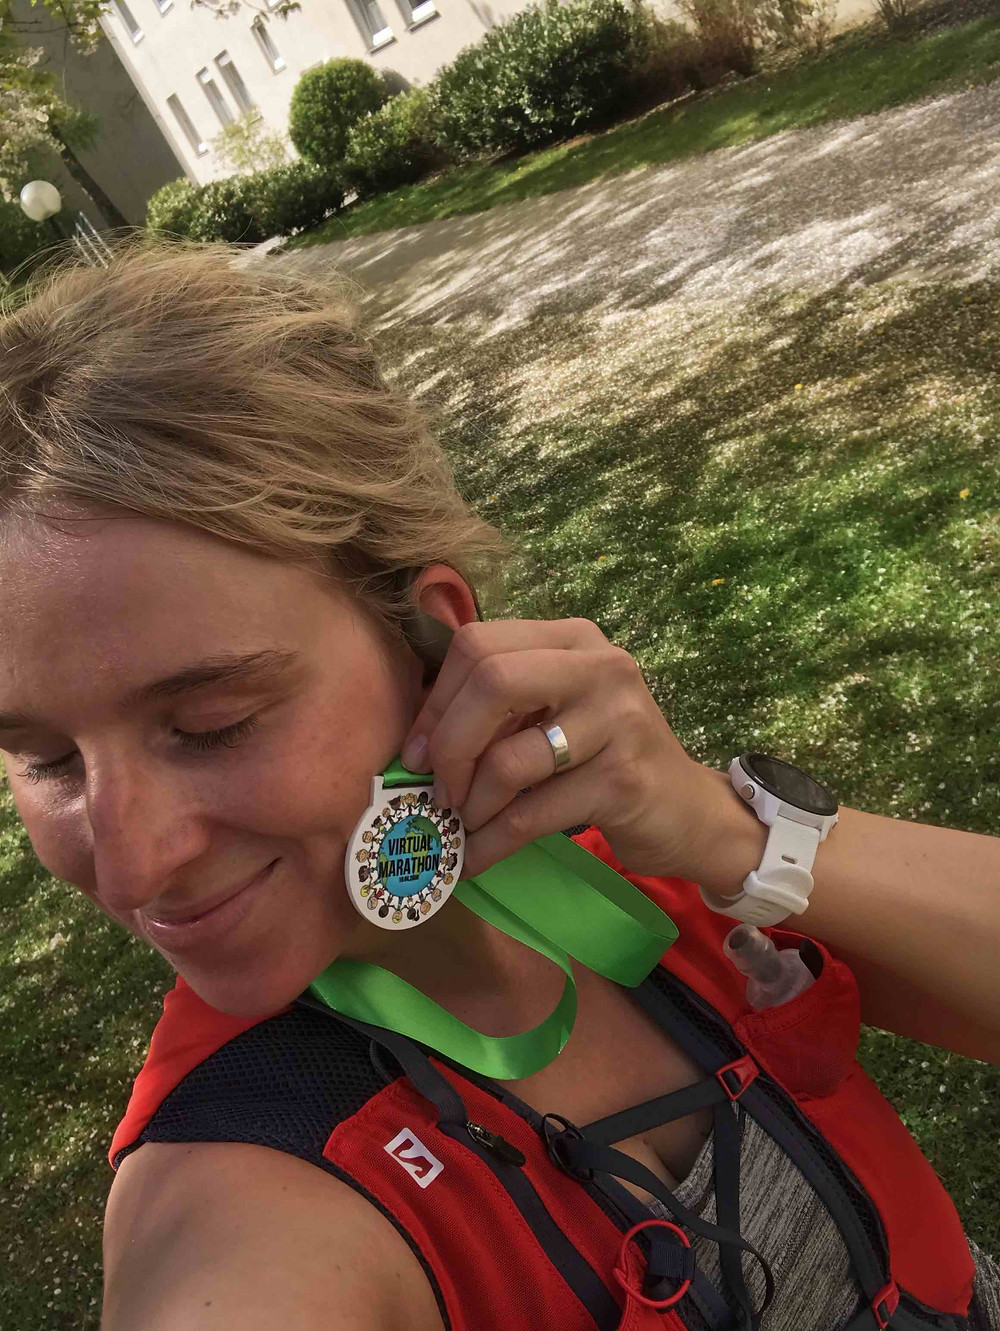 Finisher Medaille virtual run